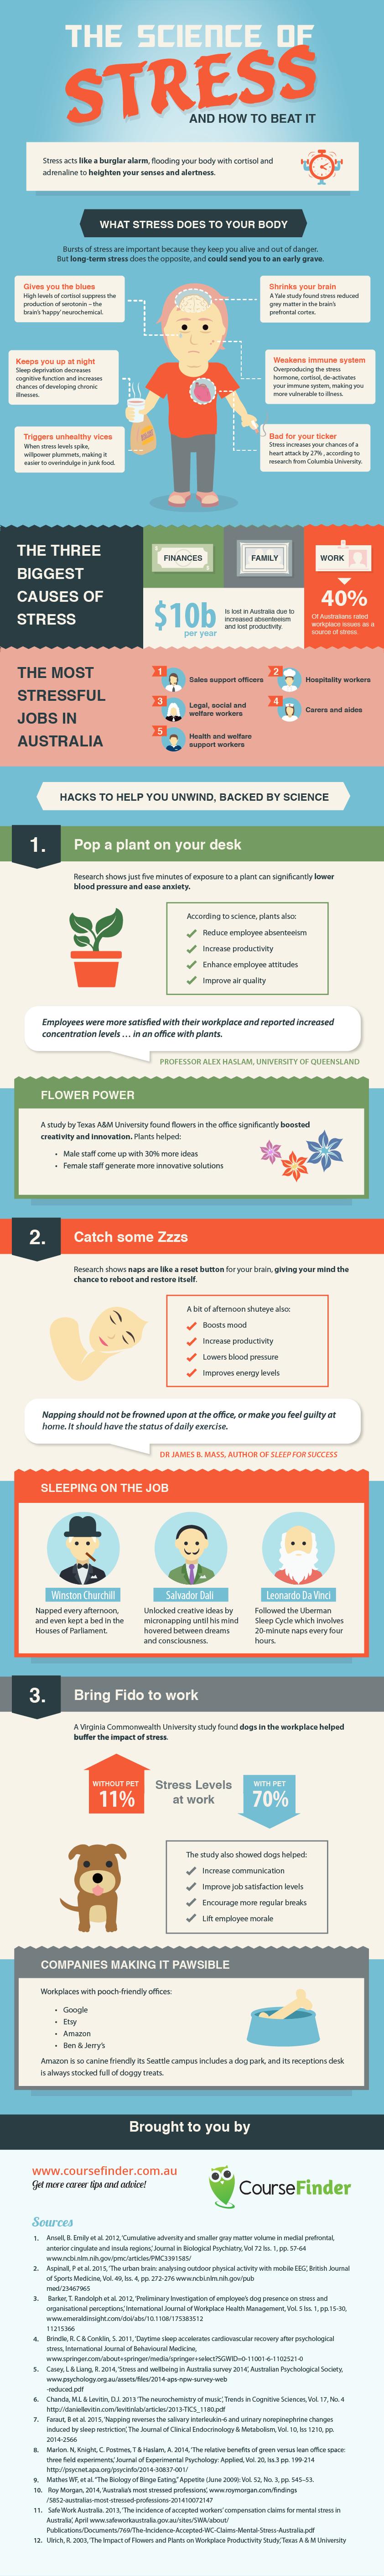 Stress Less InfographicFINAL-01